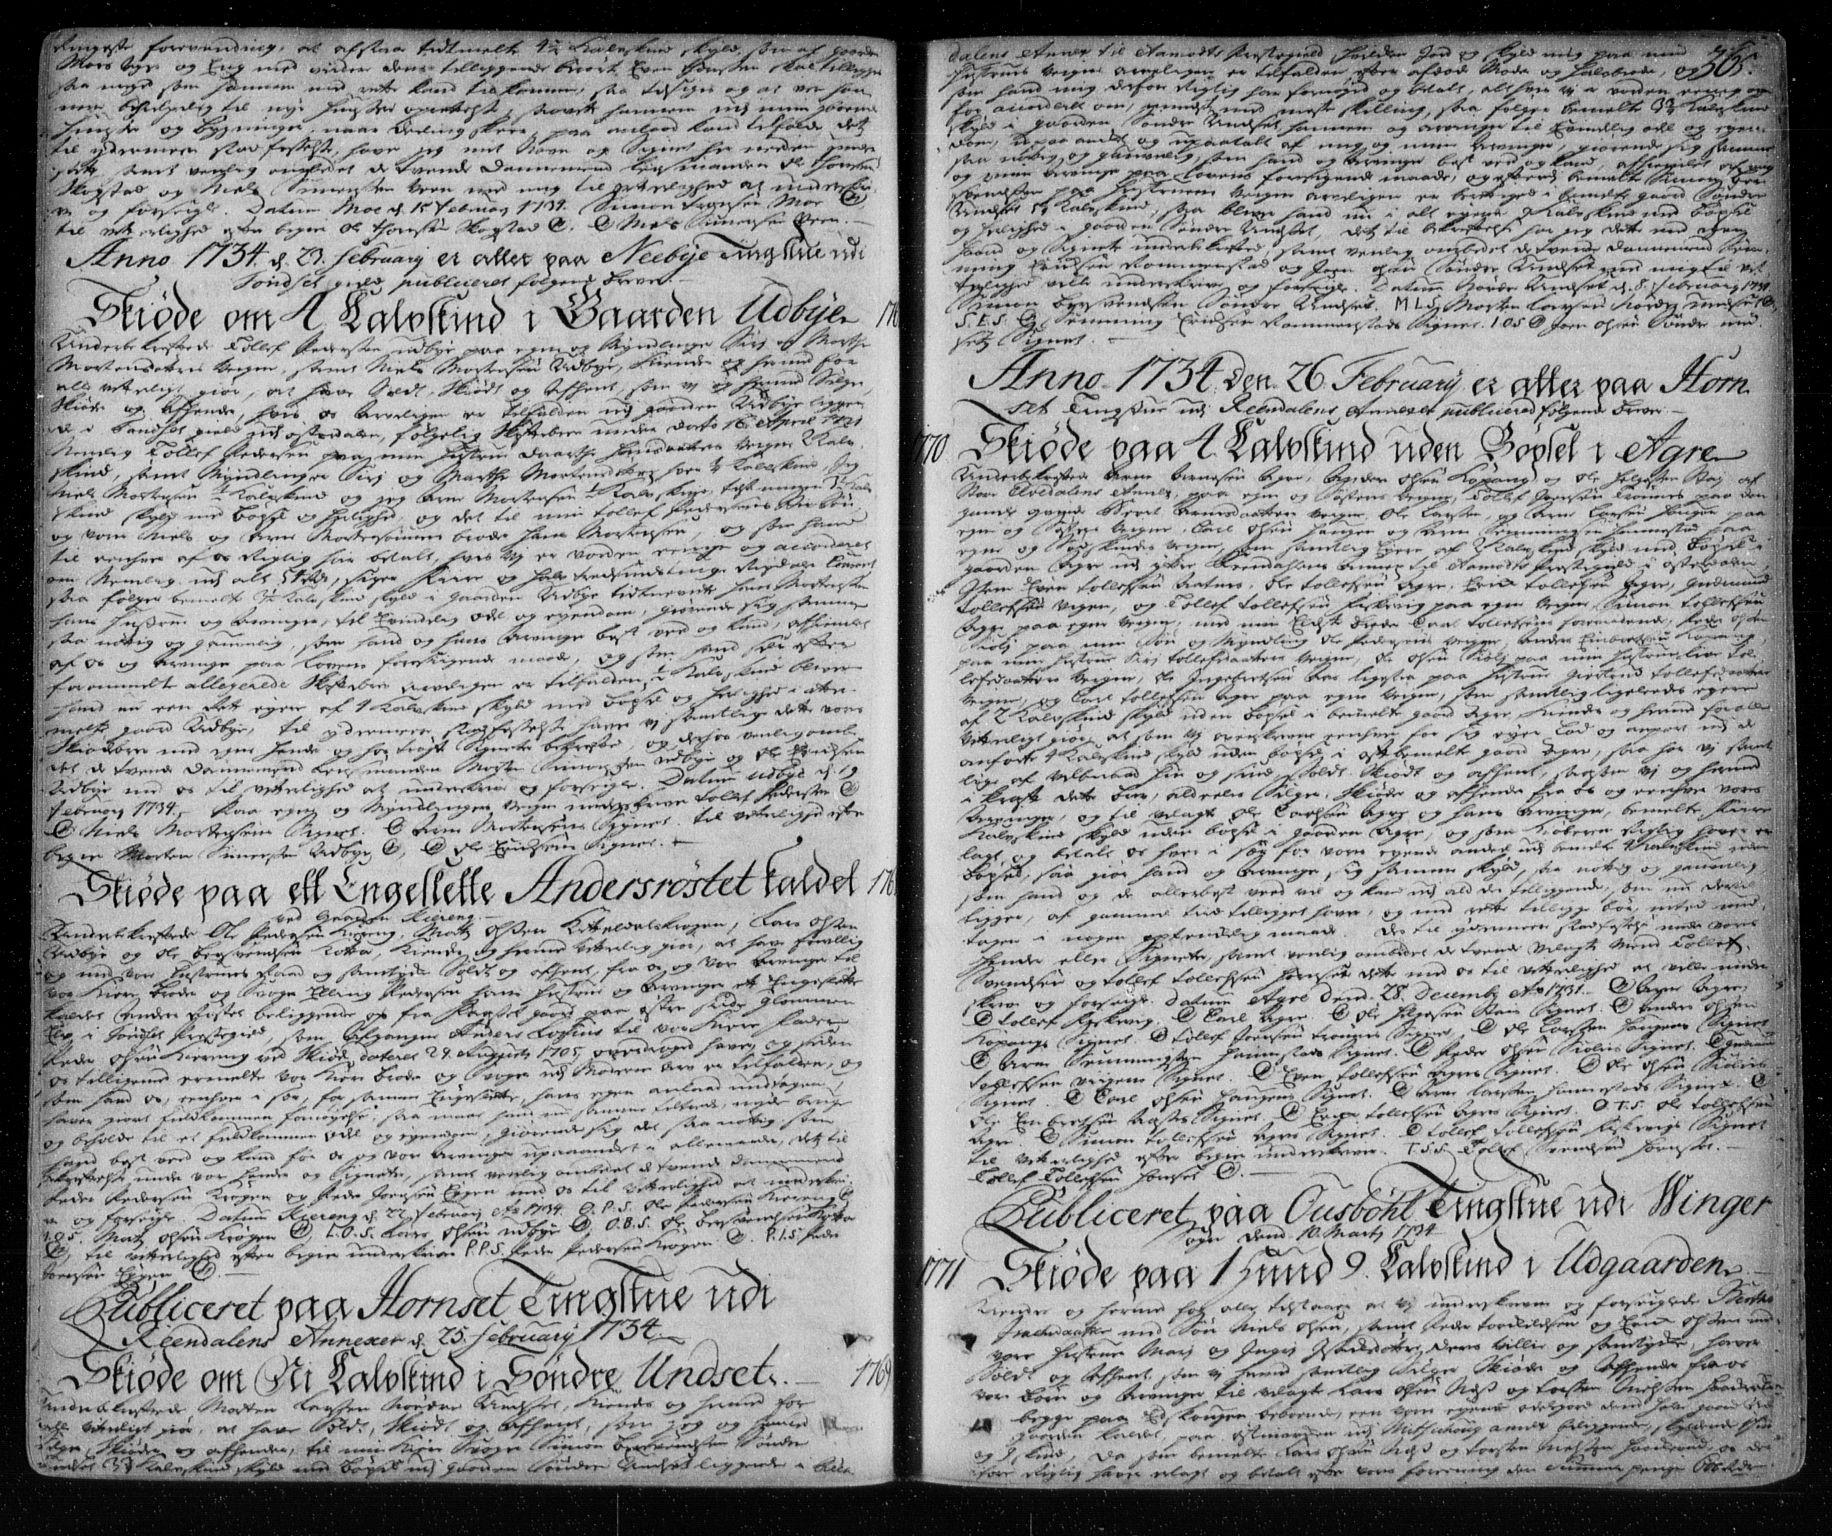 SAH, Solør og Østerdalen sorenskriveri, H/Hb/Hba/L0002: Pantebok nr. 2, 1716-1736, s. 365